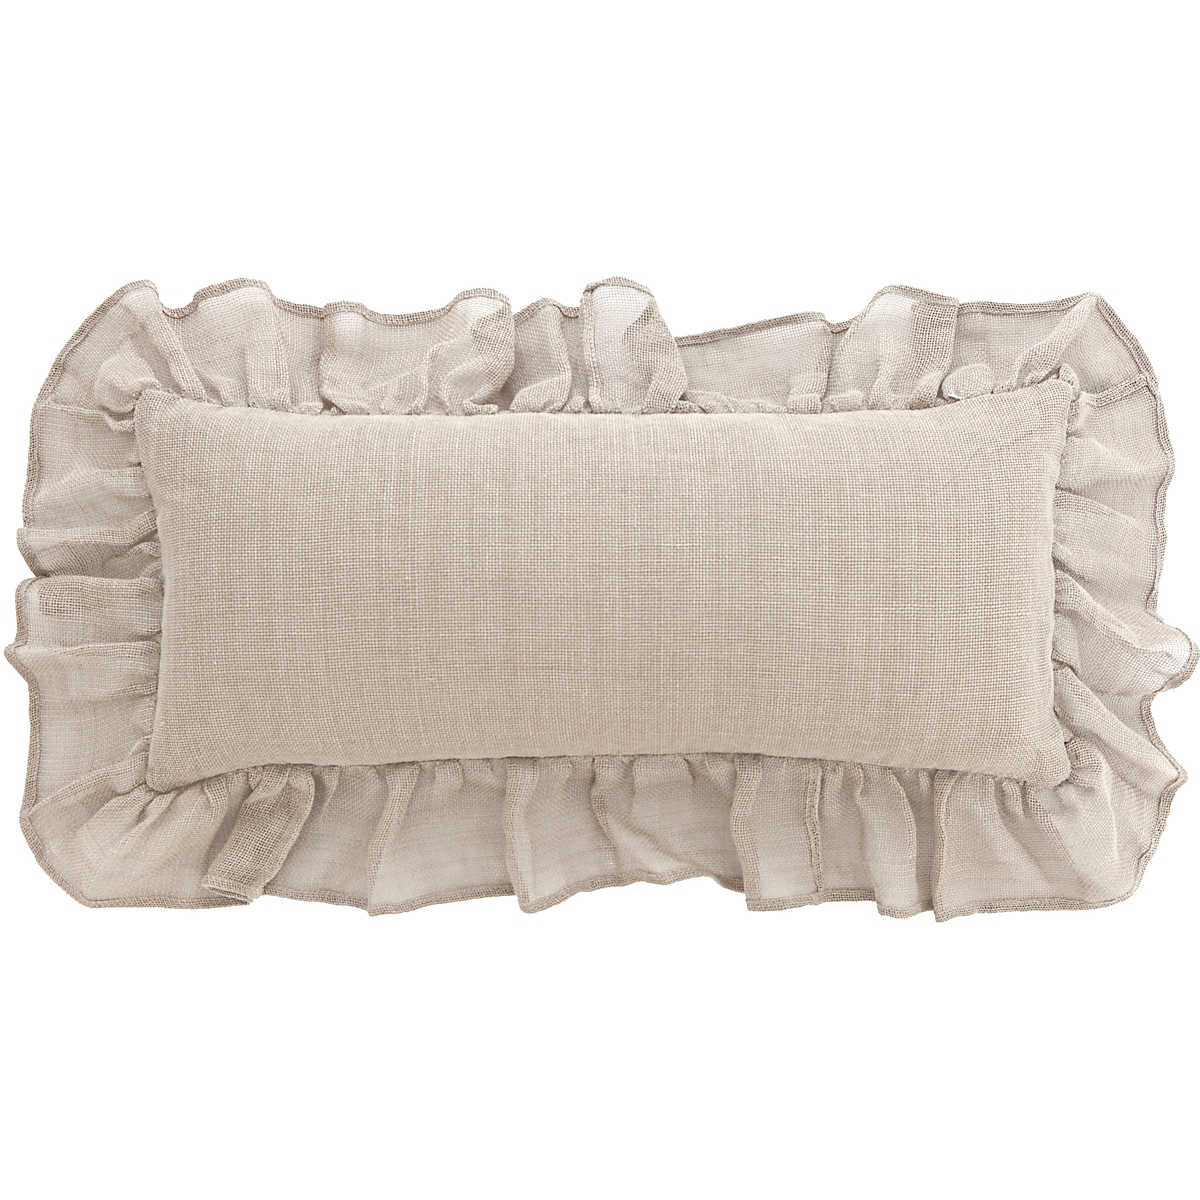 Linen Mesh Natural Decorative Pillow Pine Cone Hill